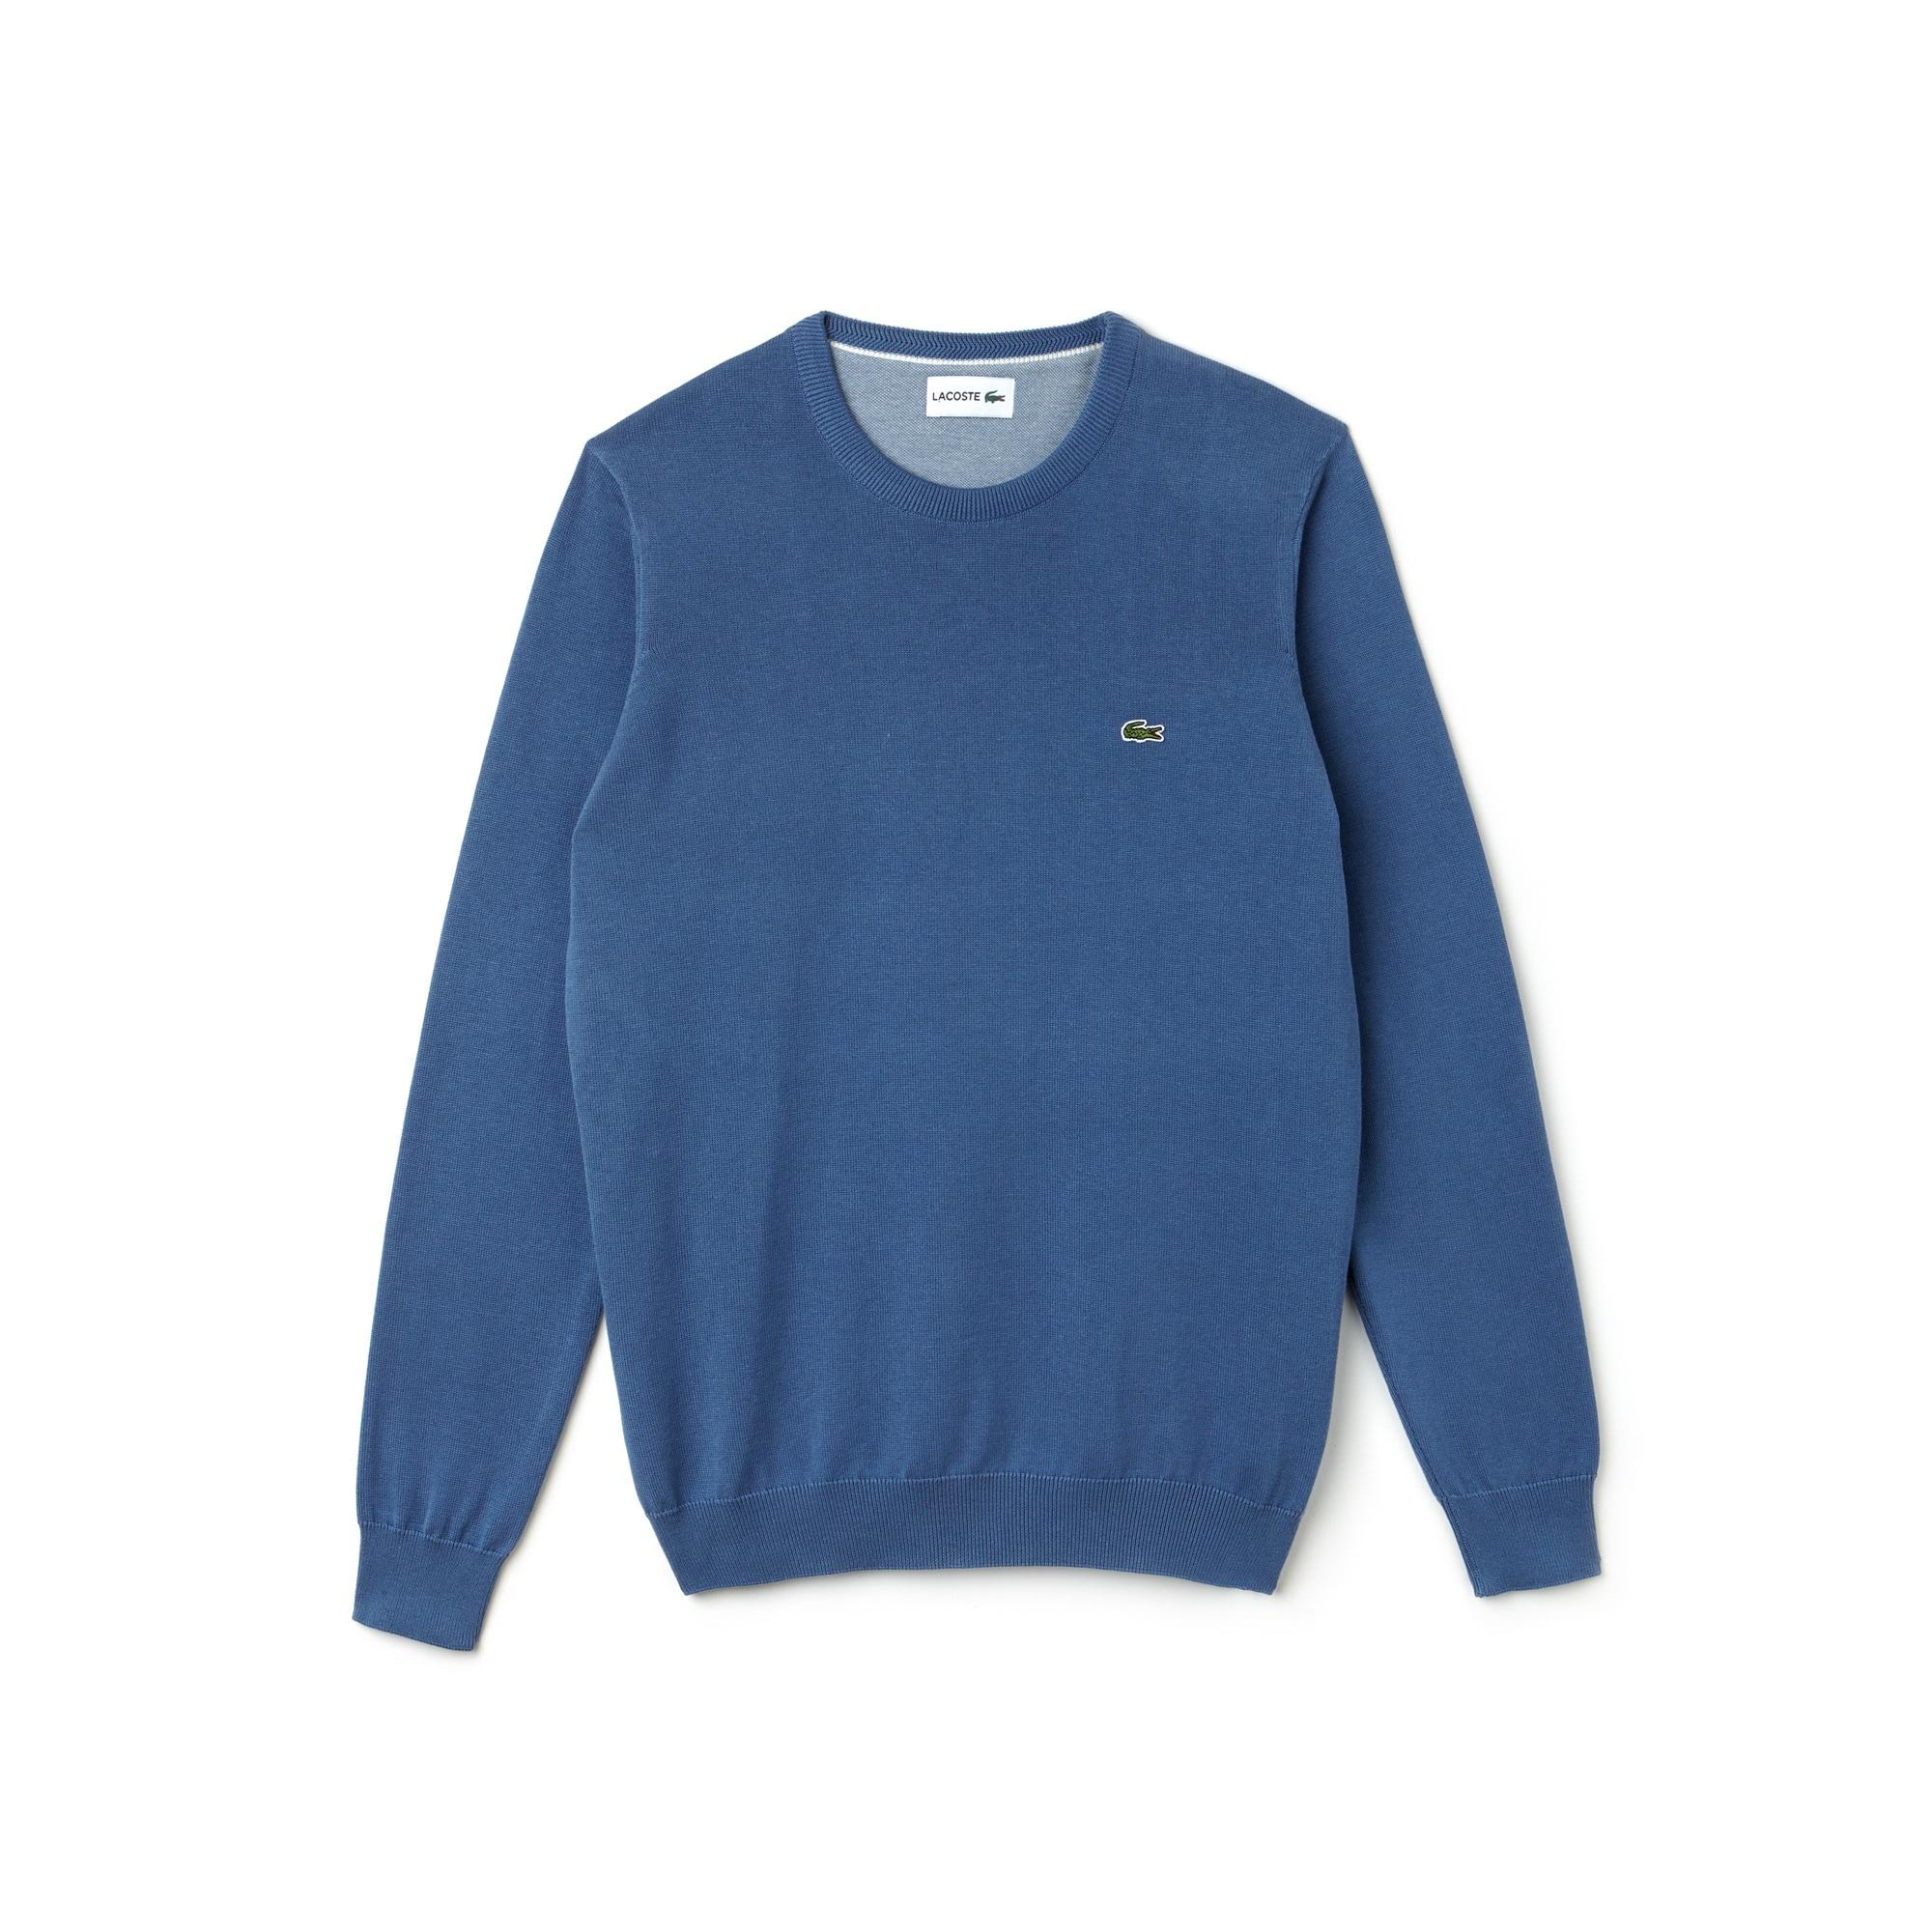 Herren-Rundhals-Pullover aus Baumwolljersey in Kaviar-Piqué-Optik